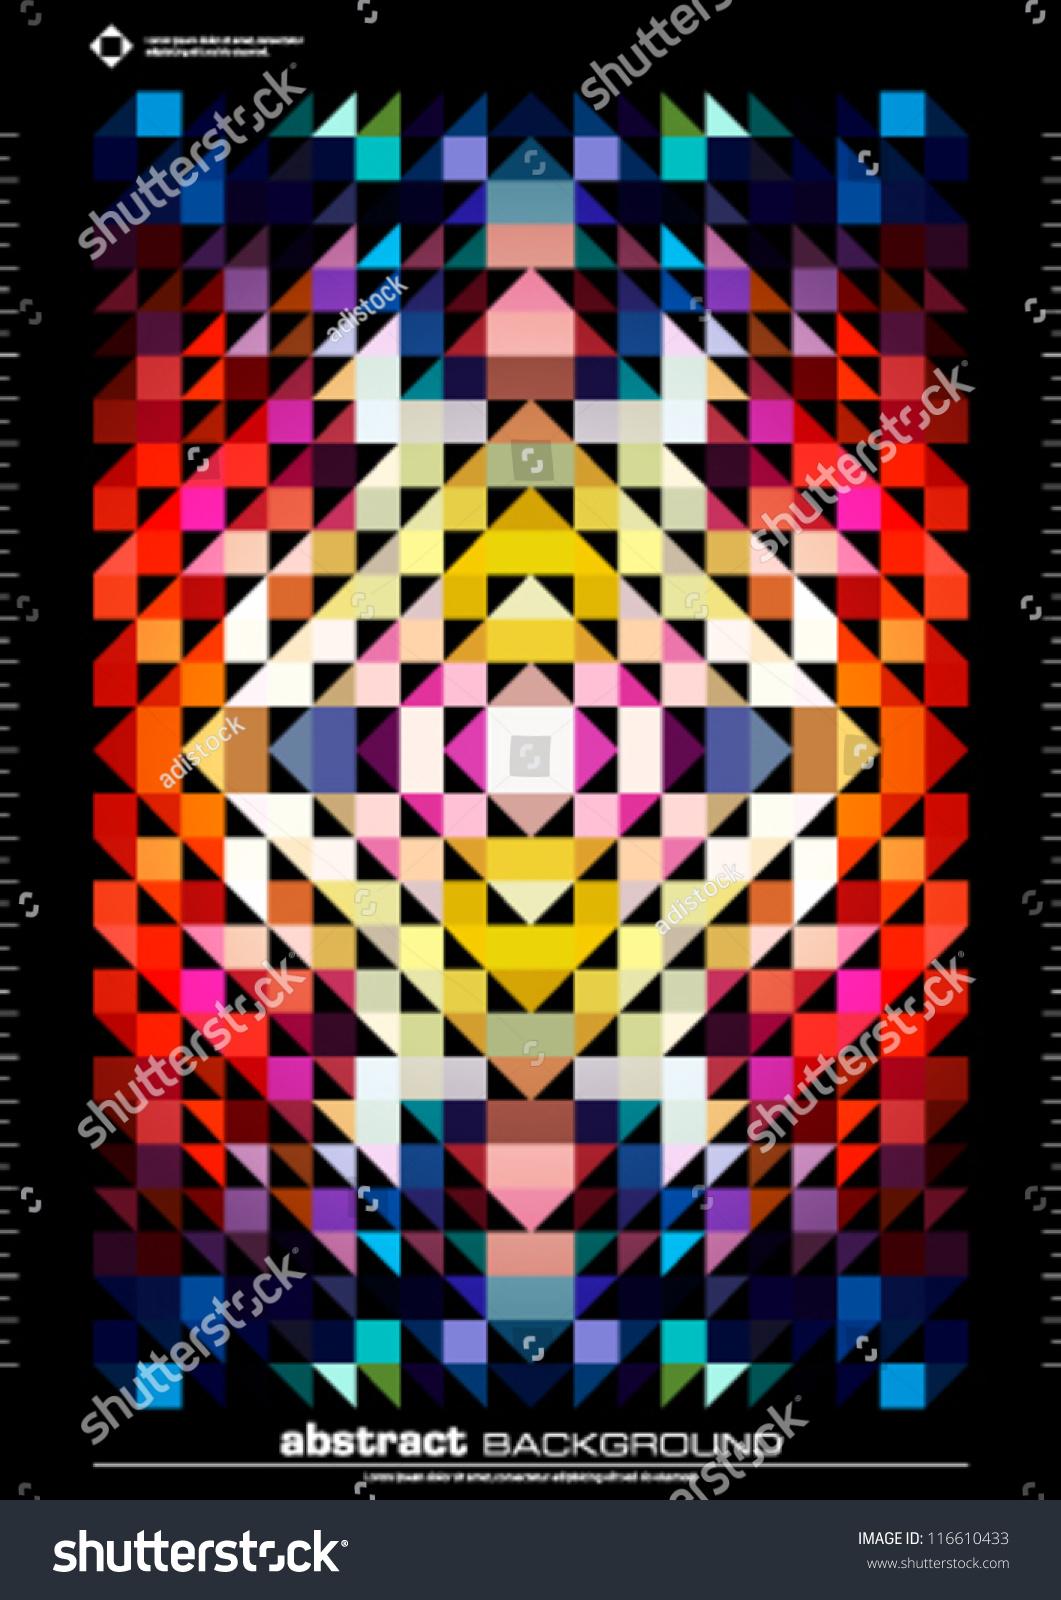 Trendy Poster Designs: Abstract Background Design Vector. Trendy Modern Design